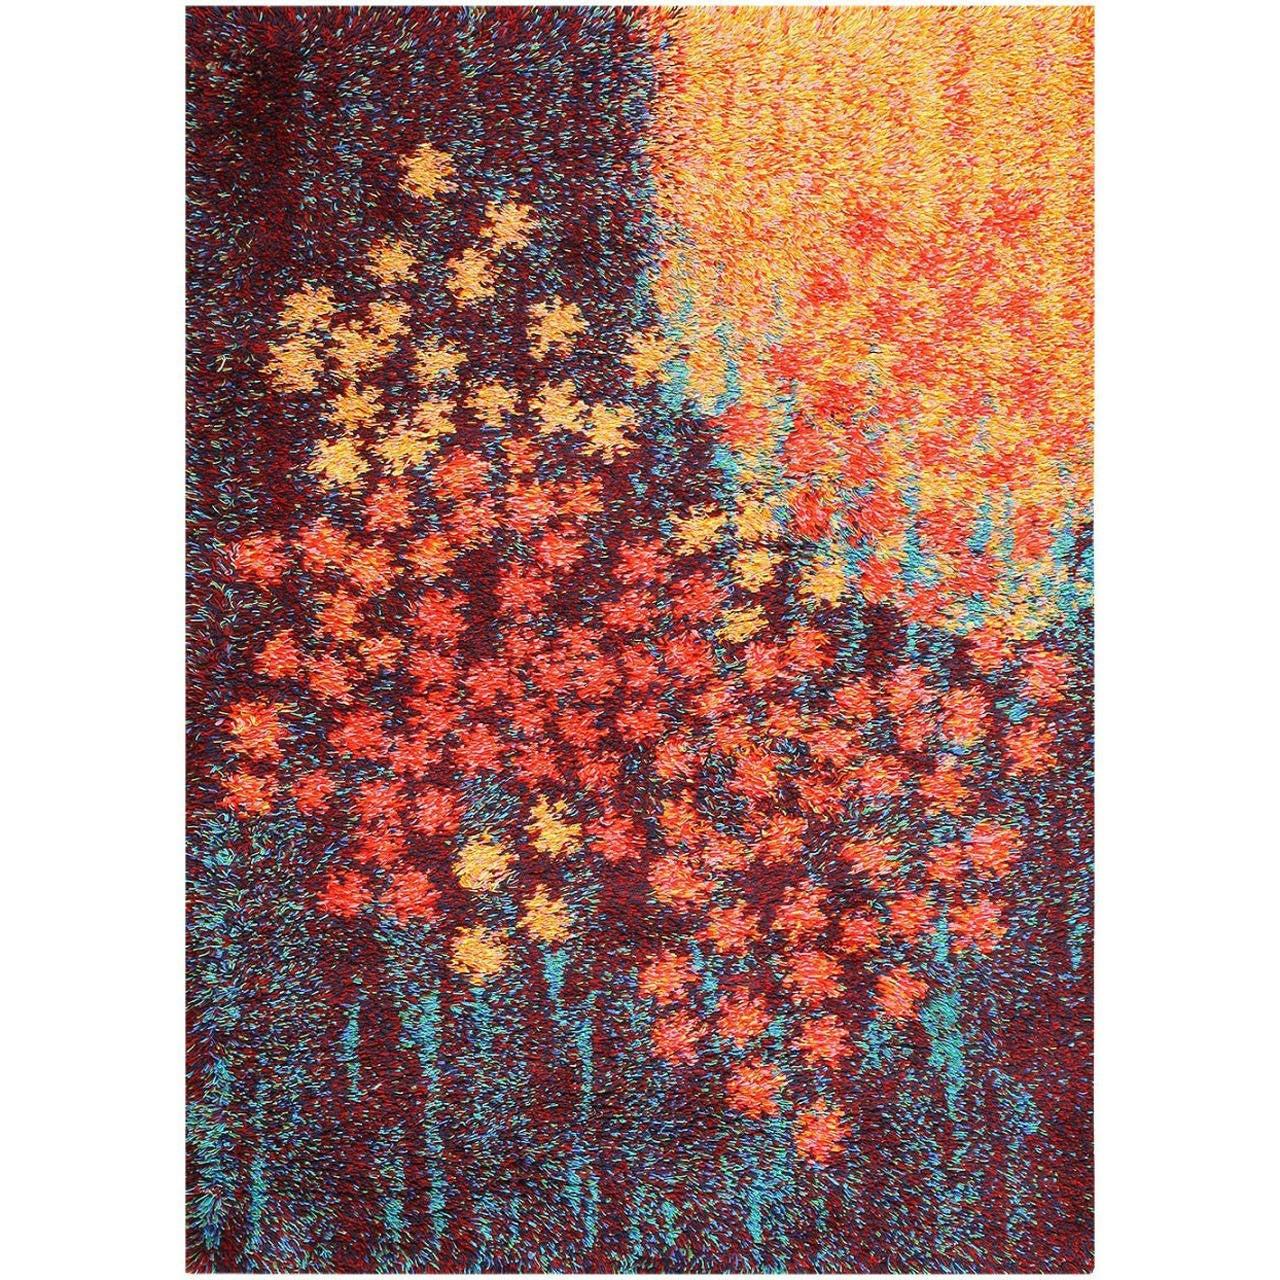 Lovely Vintage Scandinavian Rya Rug Inspired By Monet At